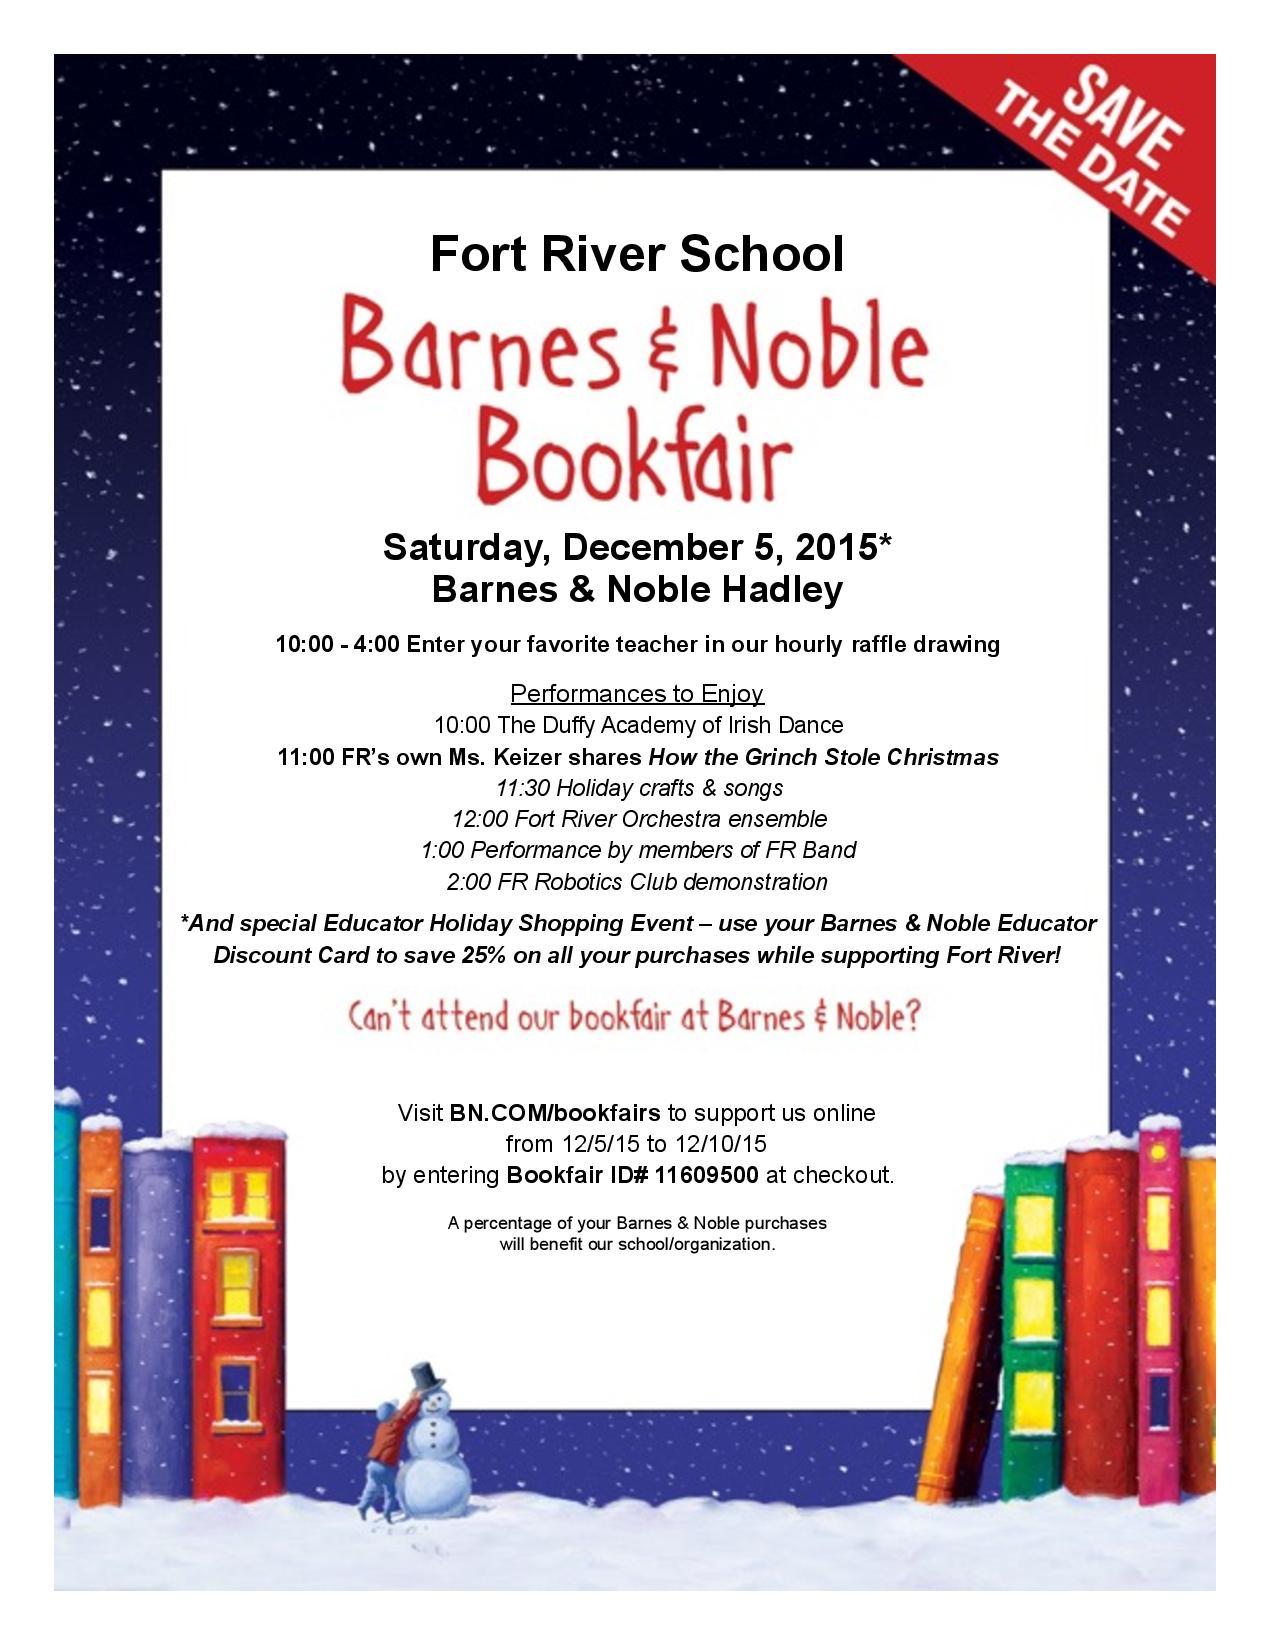 Fort River School Barnes and Noble Book Fair | ARHS PGO Parent News